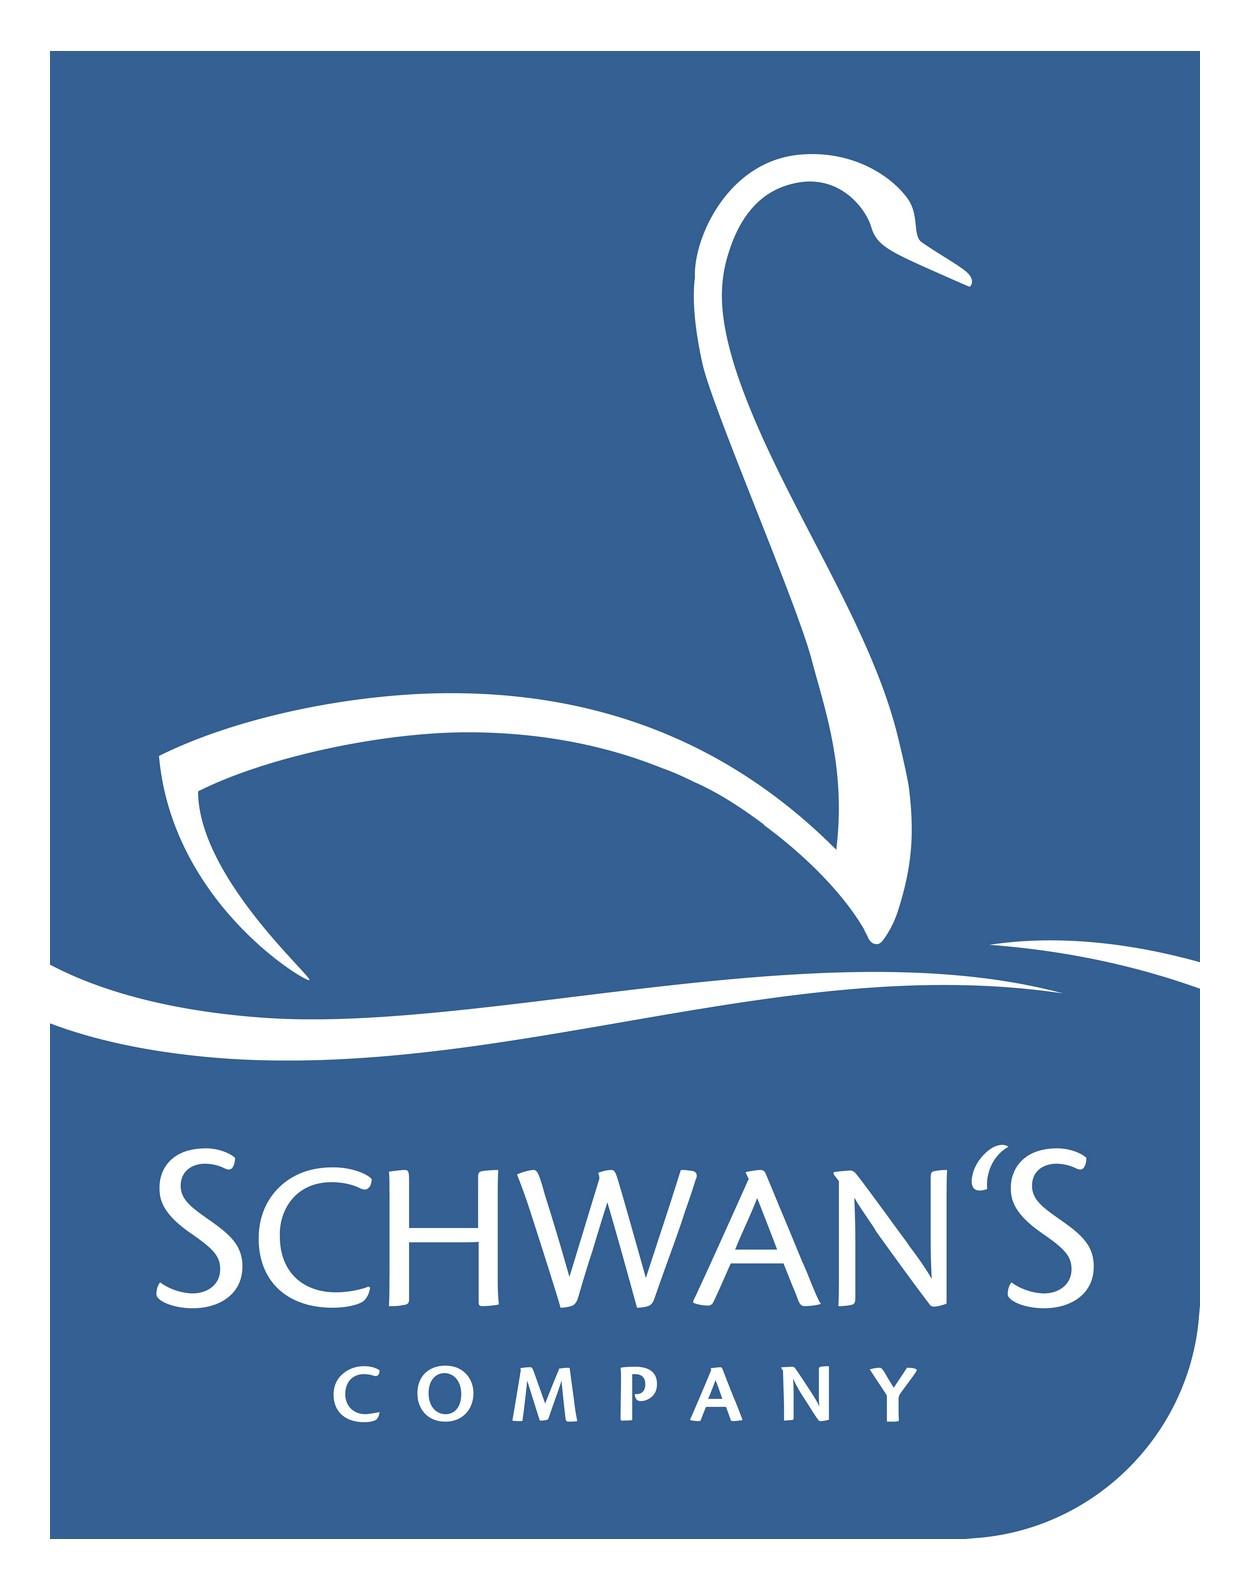 Schwans Logo png